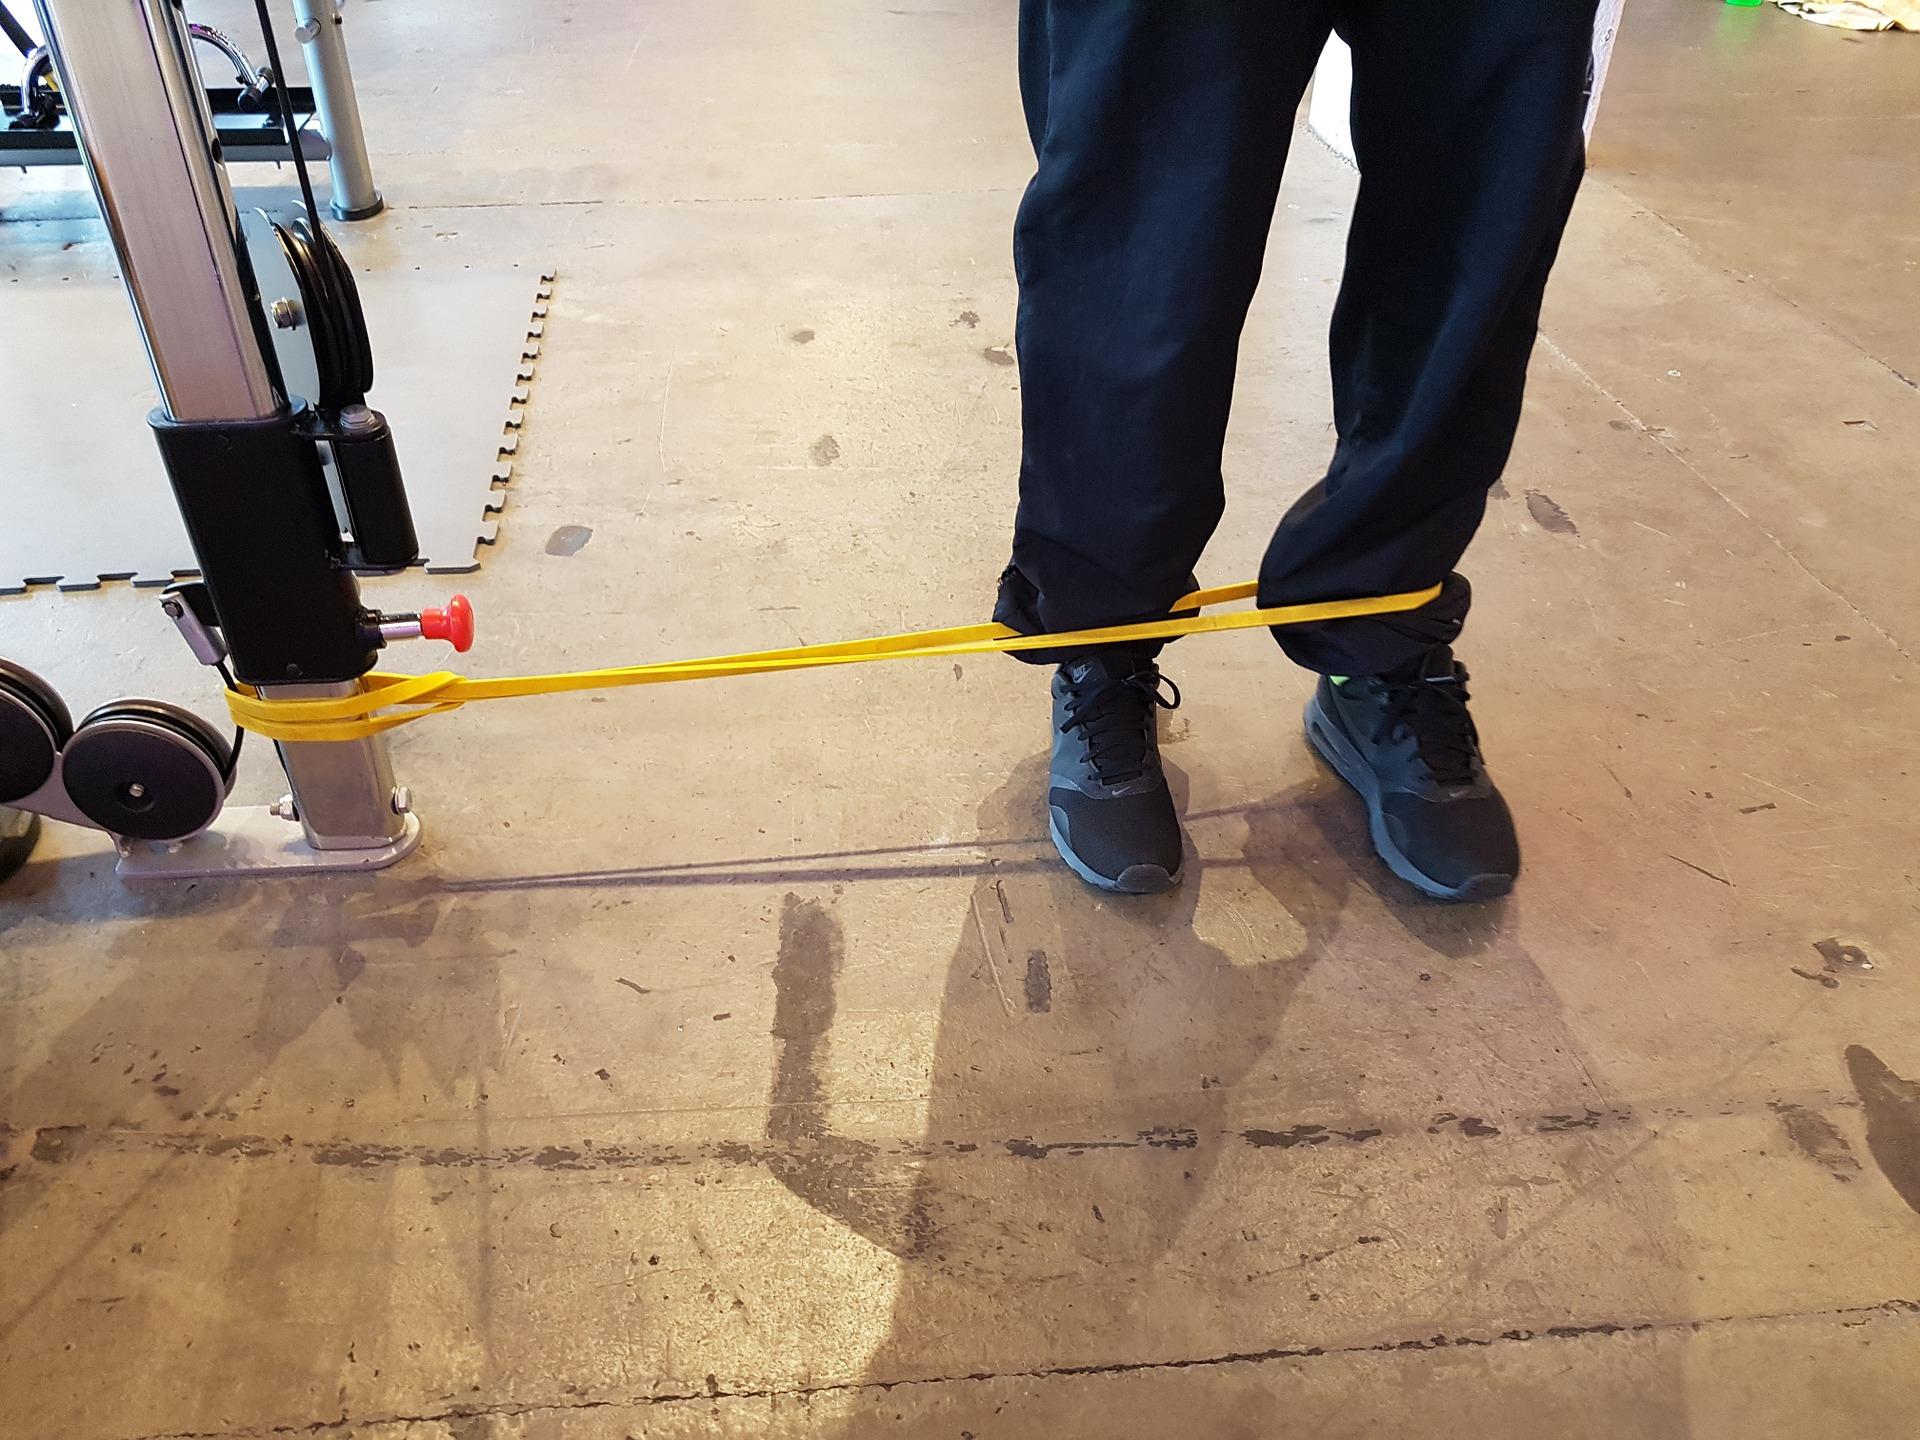 Crossfit Schuhe fuer Krafttraining